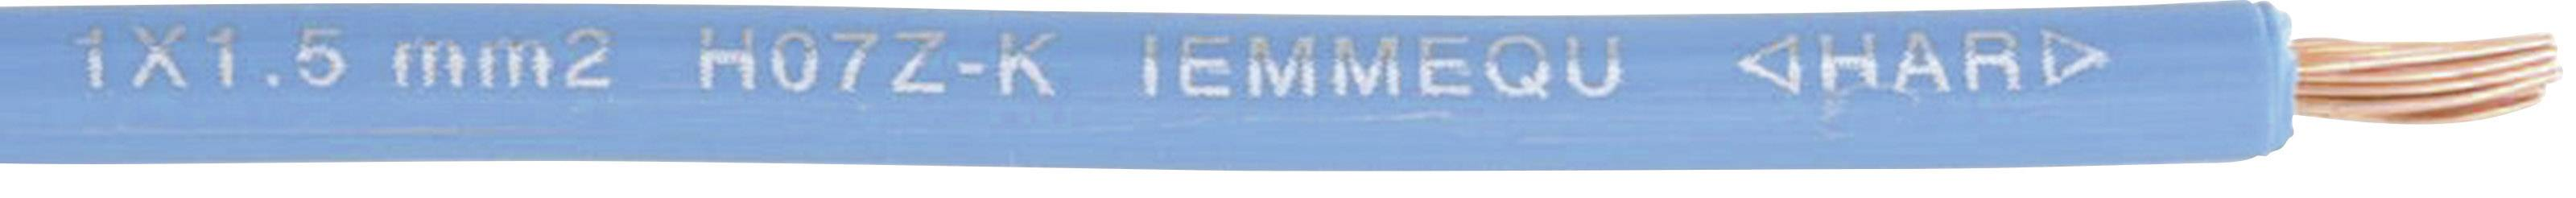 Opletenie / lanko Faber Kabel 040298 H05Z-K, 1 x 1 mm², vonkajší Ø 2.50 mm, 100 m, svetlomodrá